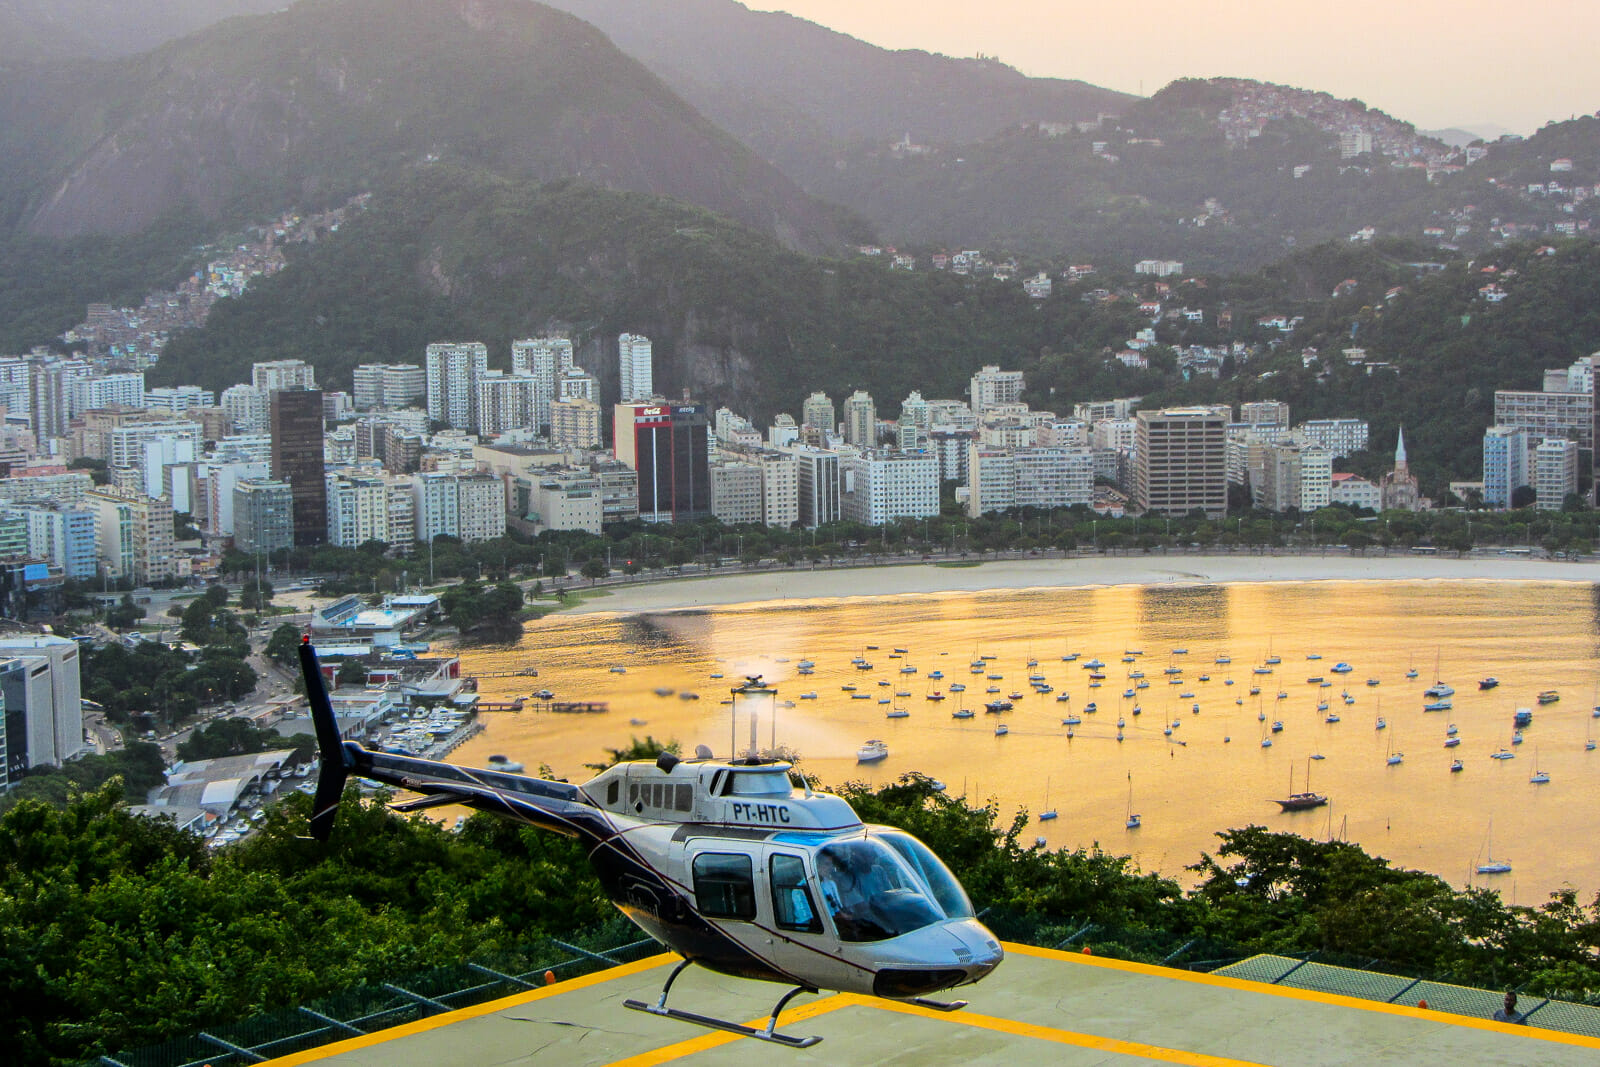 The natural beauty of Rio de Janeiro, Brazil